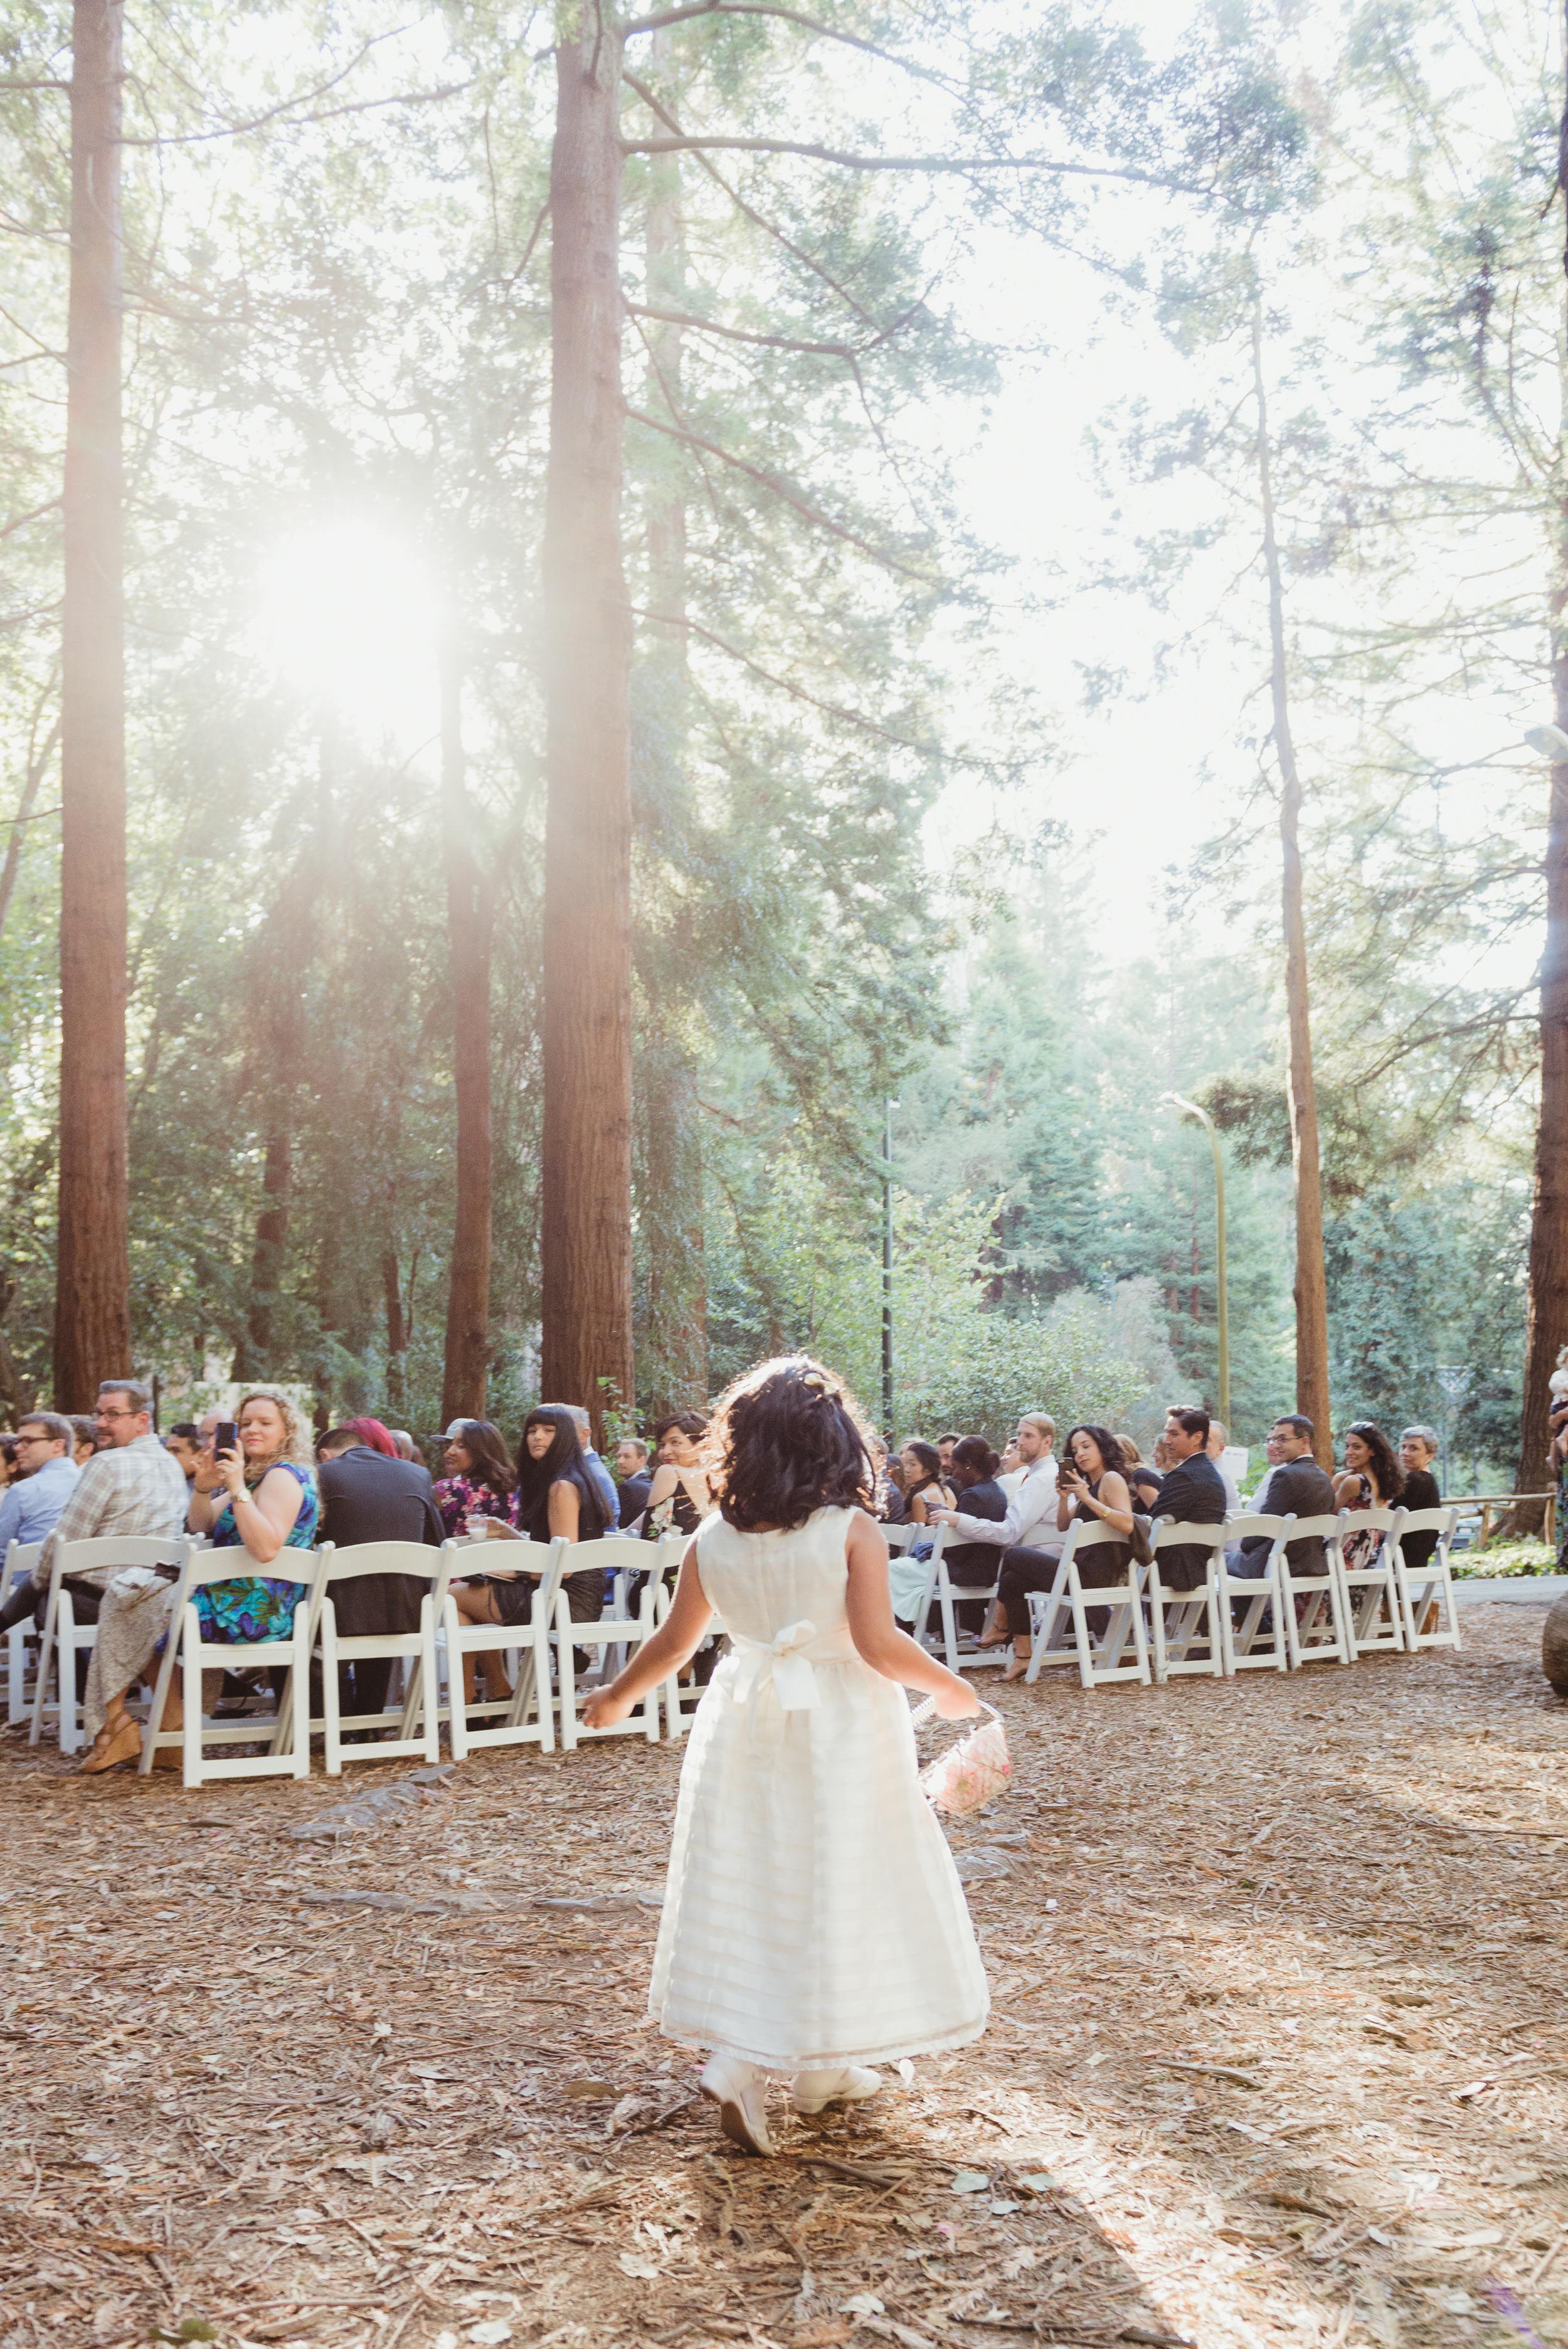 25san-francisco-stern-grove-wedding-photographer-vivianchen-199.jpg